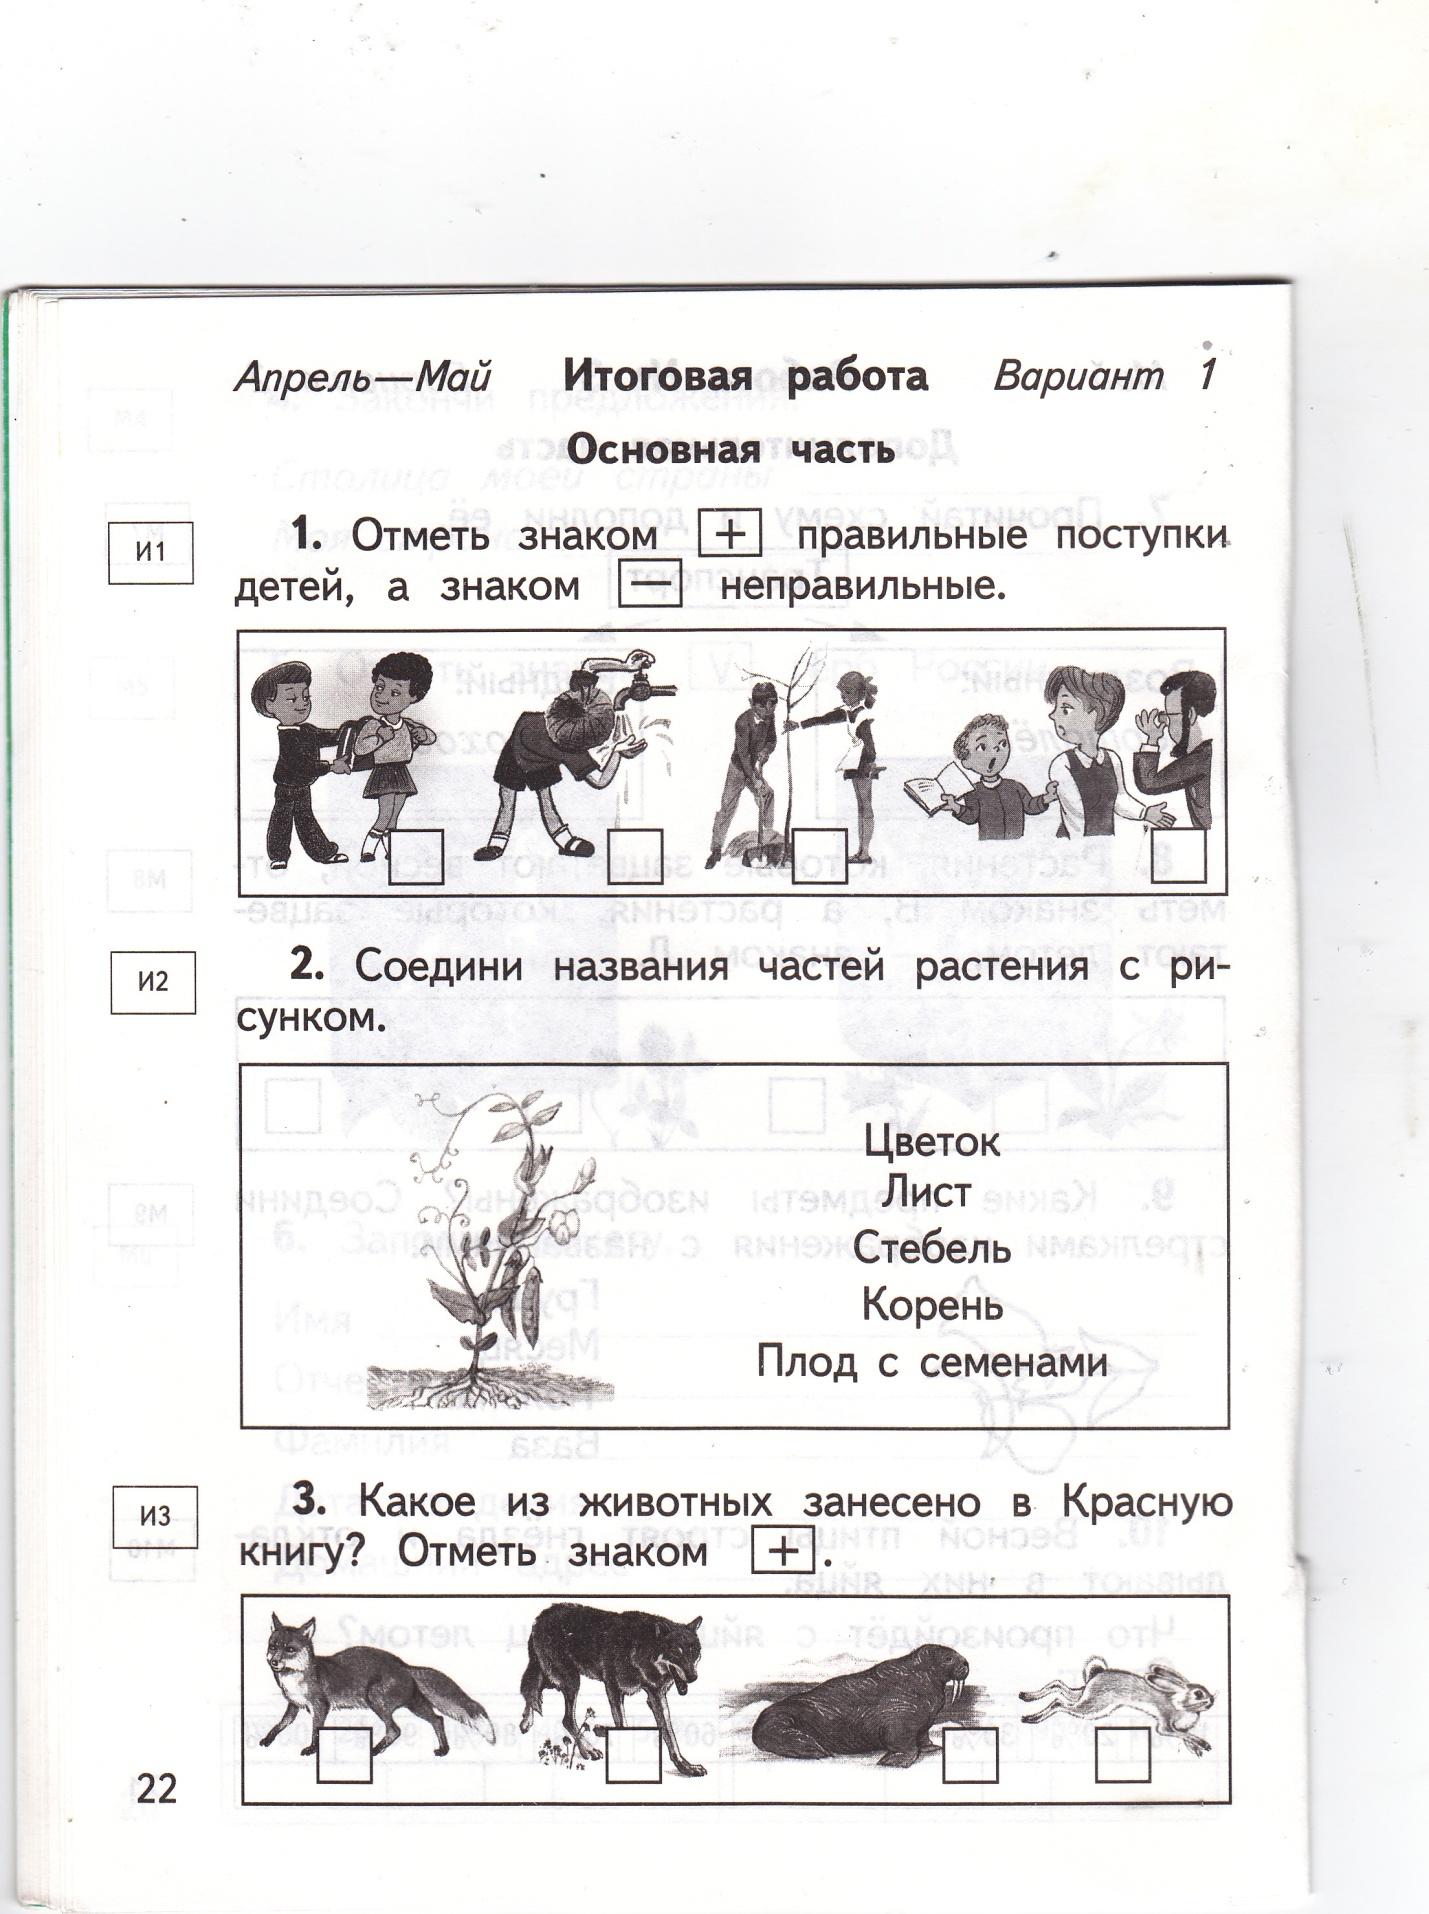 C:\Users\МБОУ СОШ № 4\Desktop\для Жуковой С.Н\IMG_0032.jpg